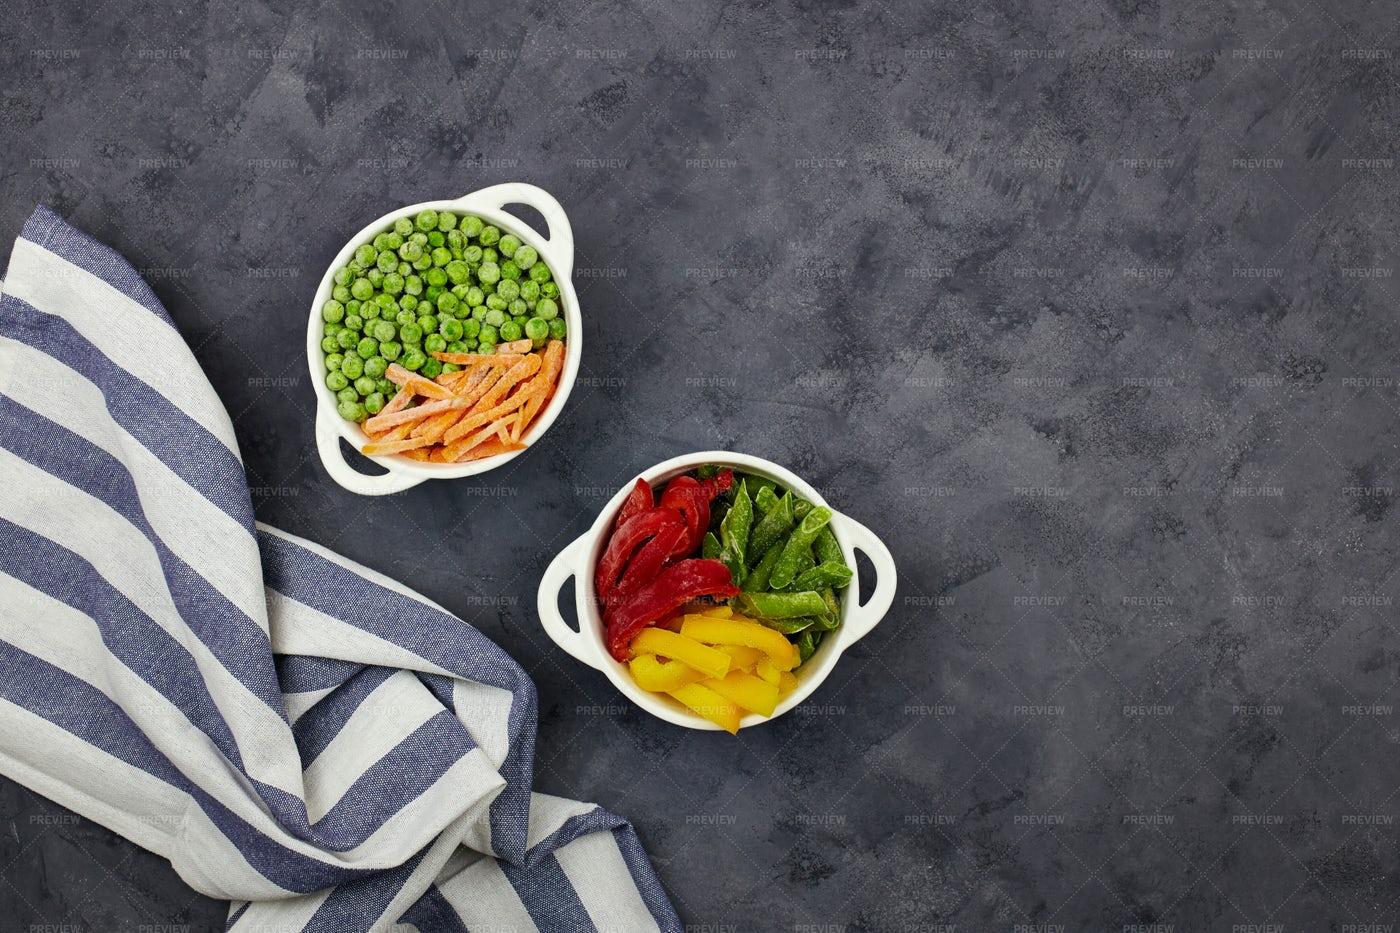 Frozen Vegetables: Stock Photos